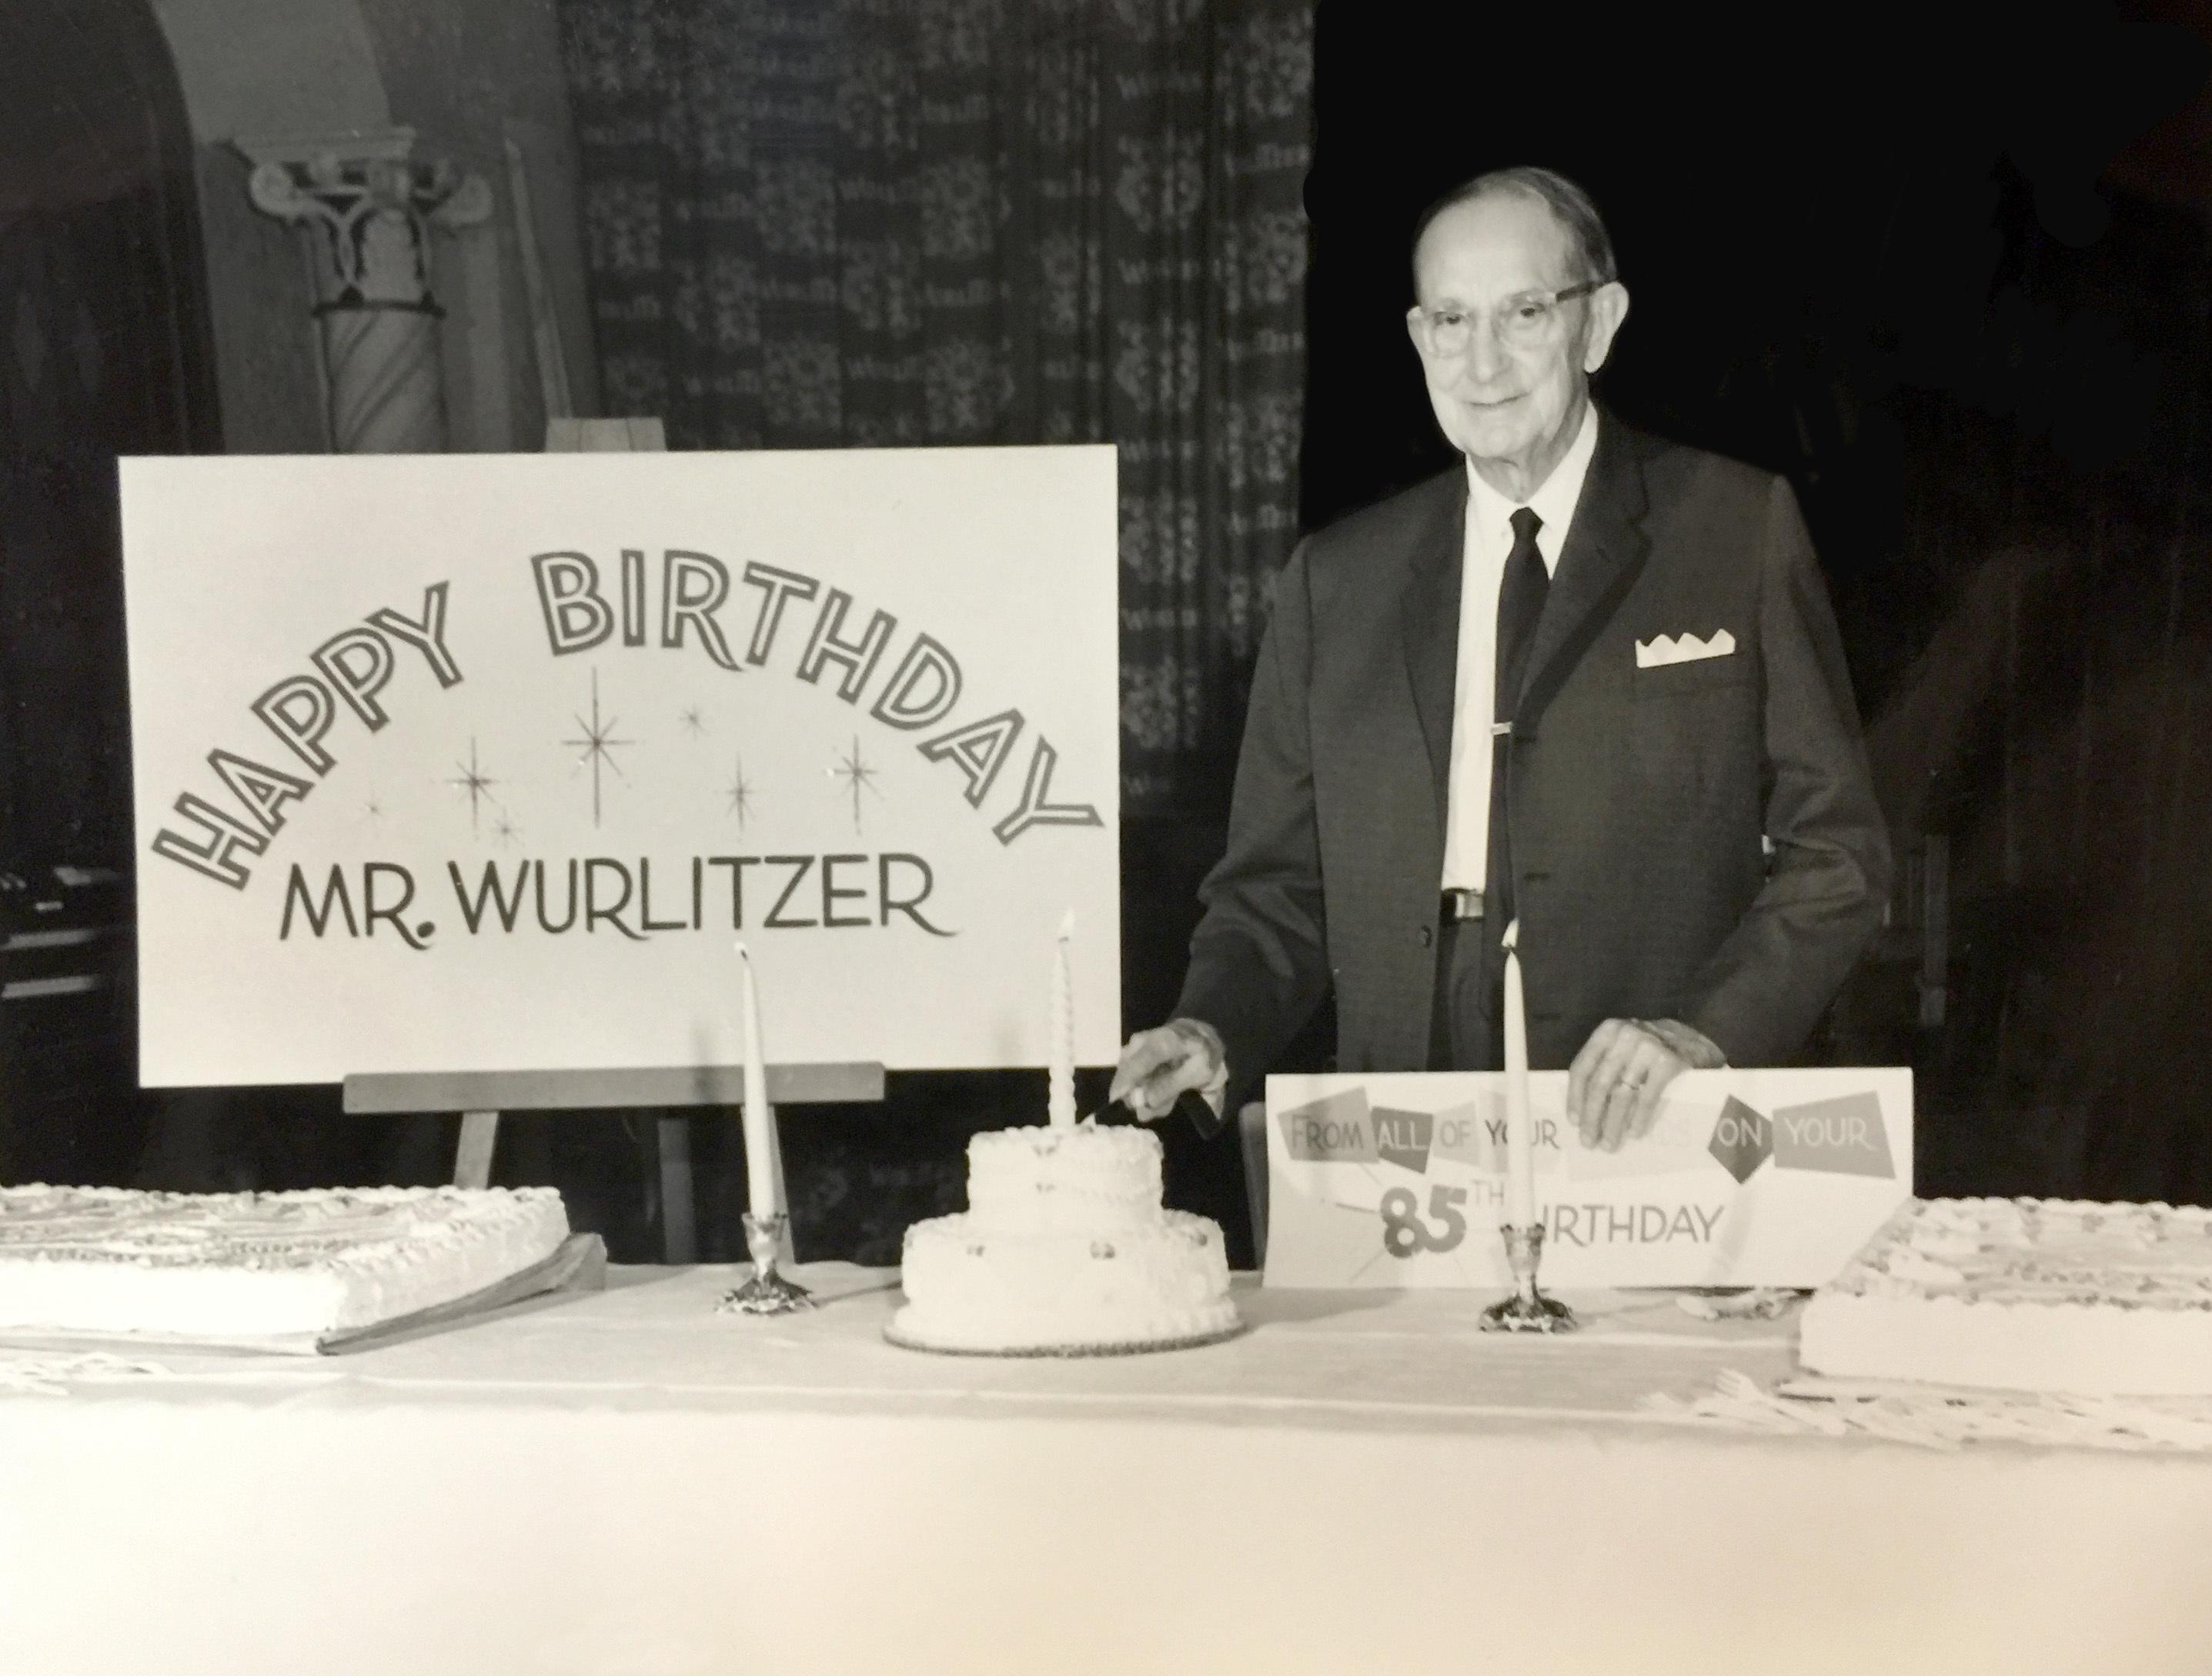 Farny Wurlitzer 85th birthday, photo (NTPL 1968).jpg